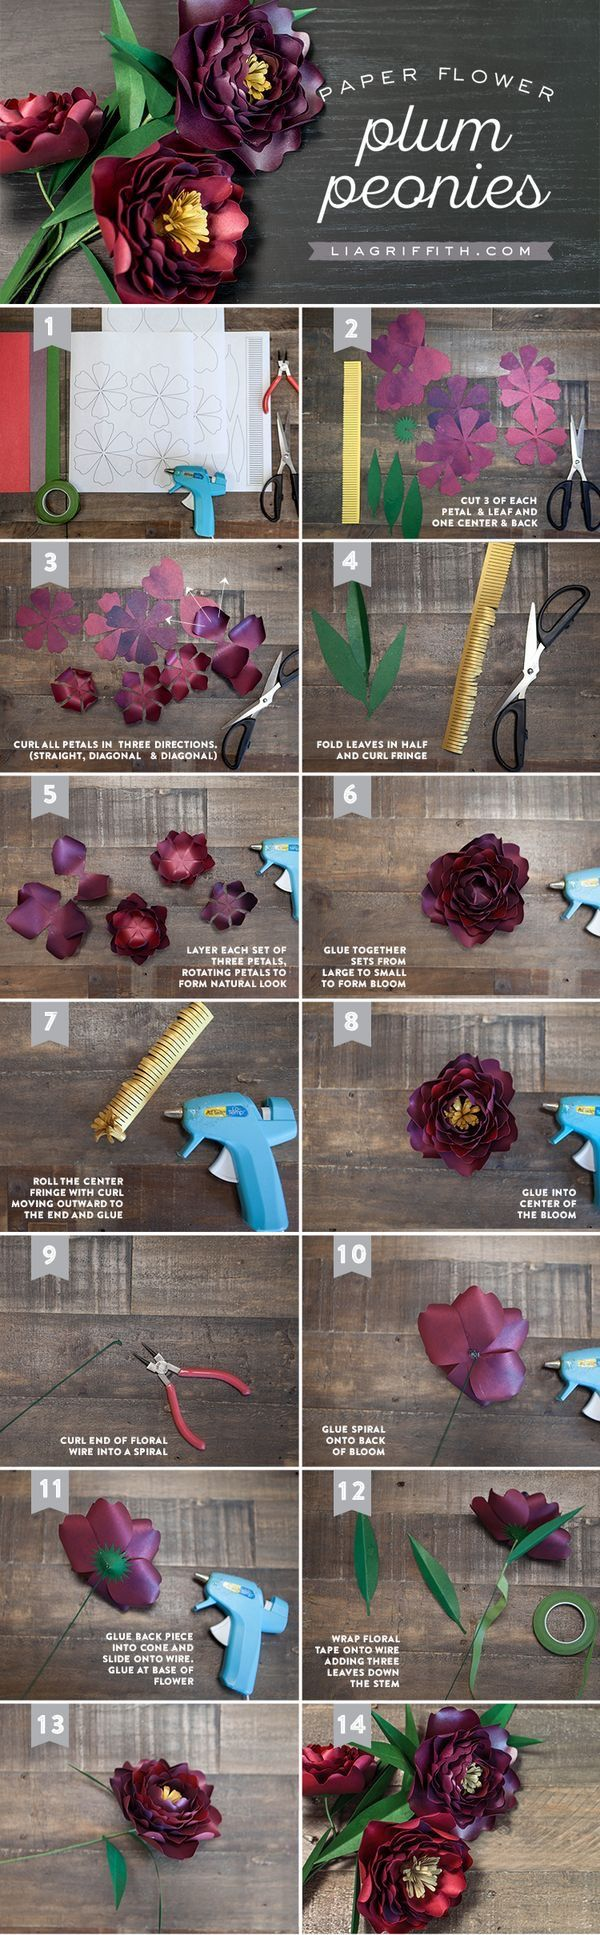 28 best DIY and décor images on Pinterest | Creative ideas ...